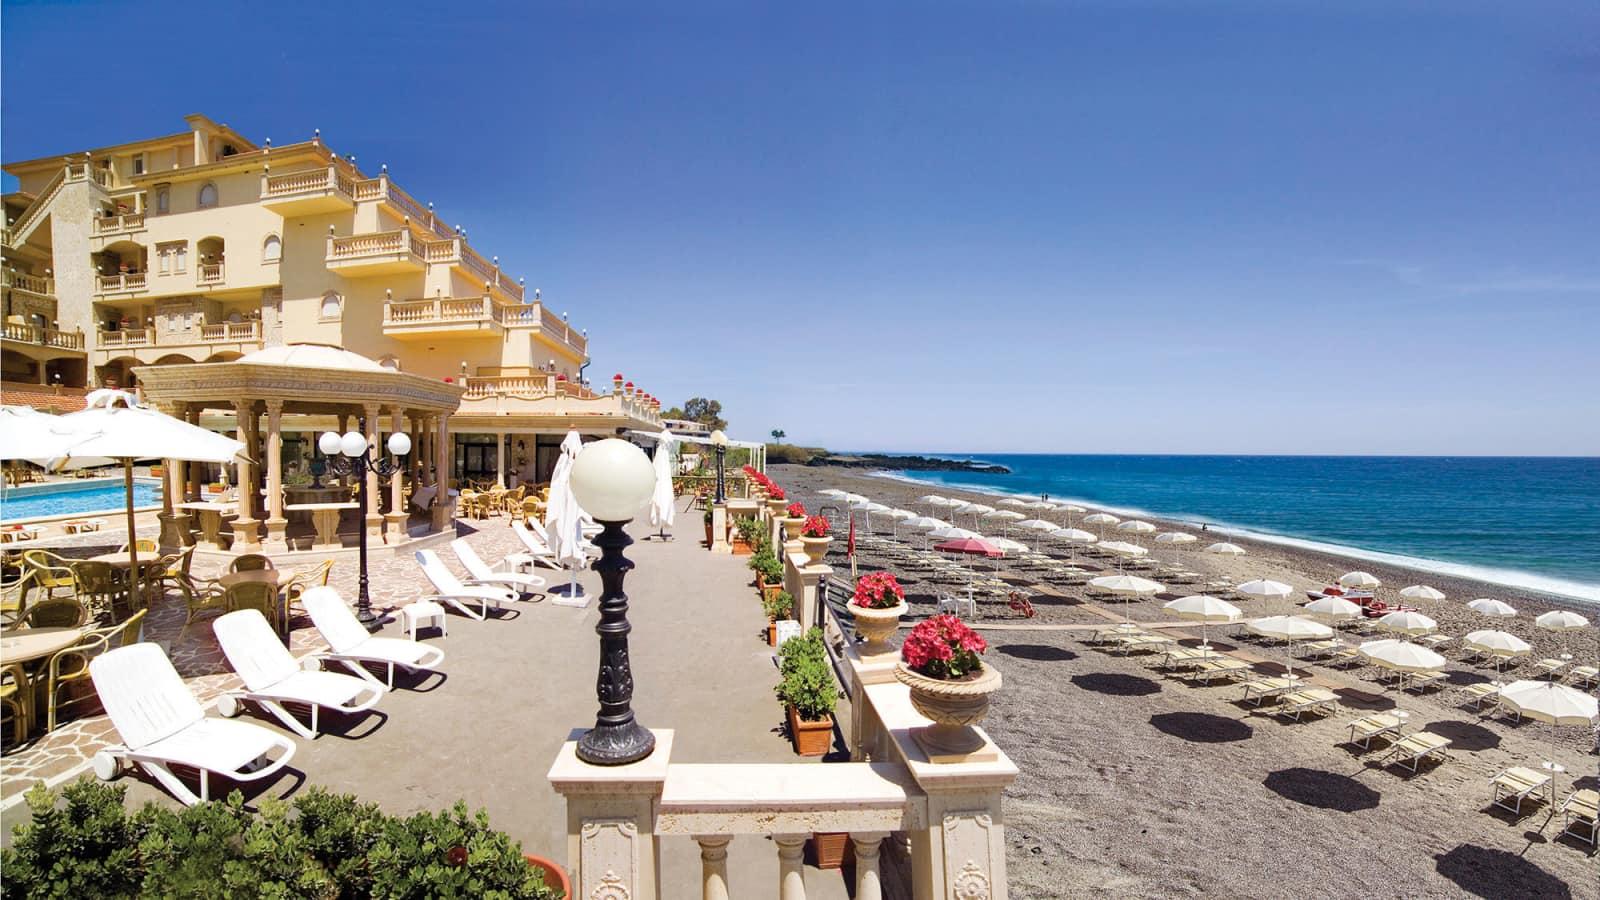 Giardini naxos holidays sicily holidays with topflight